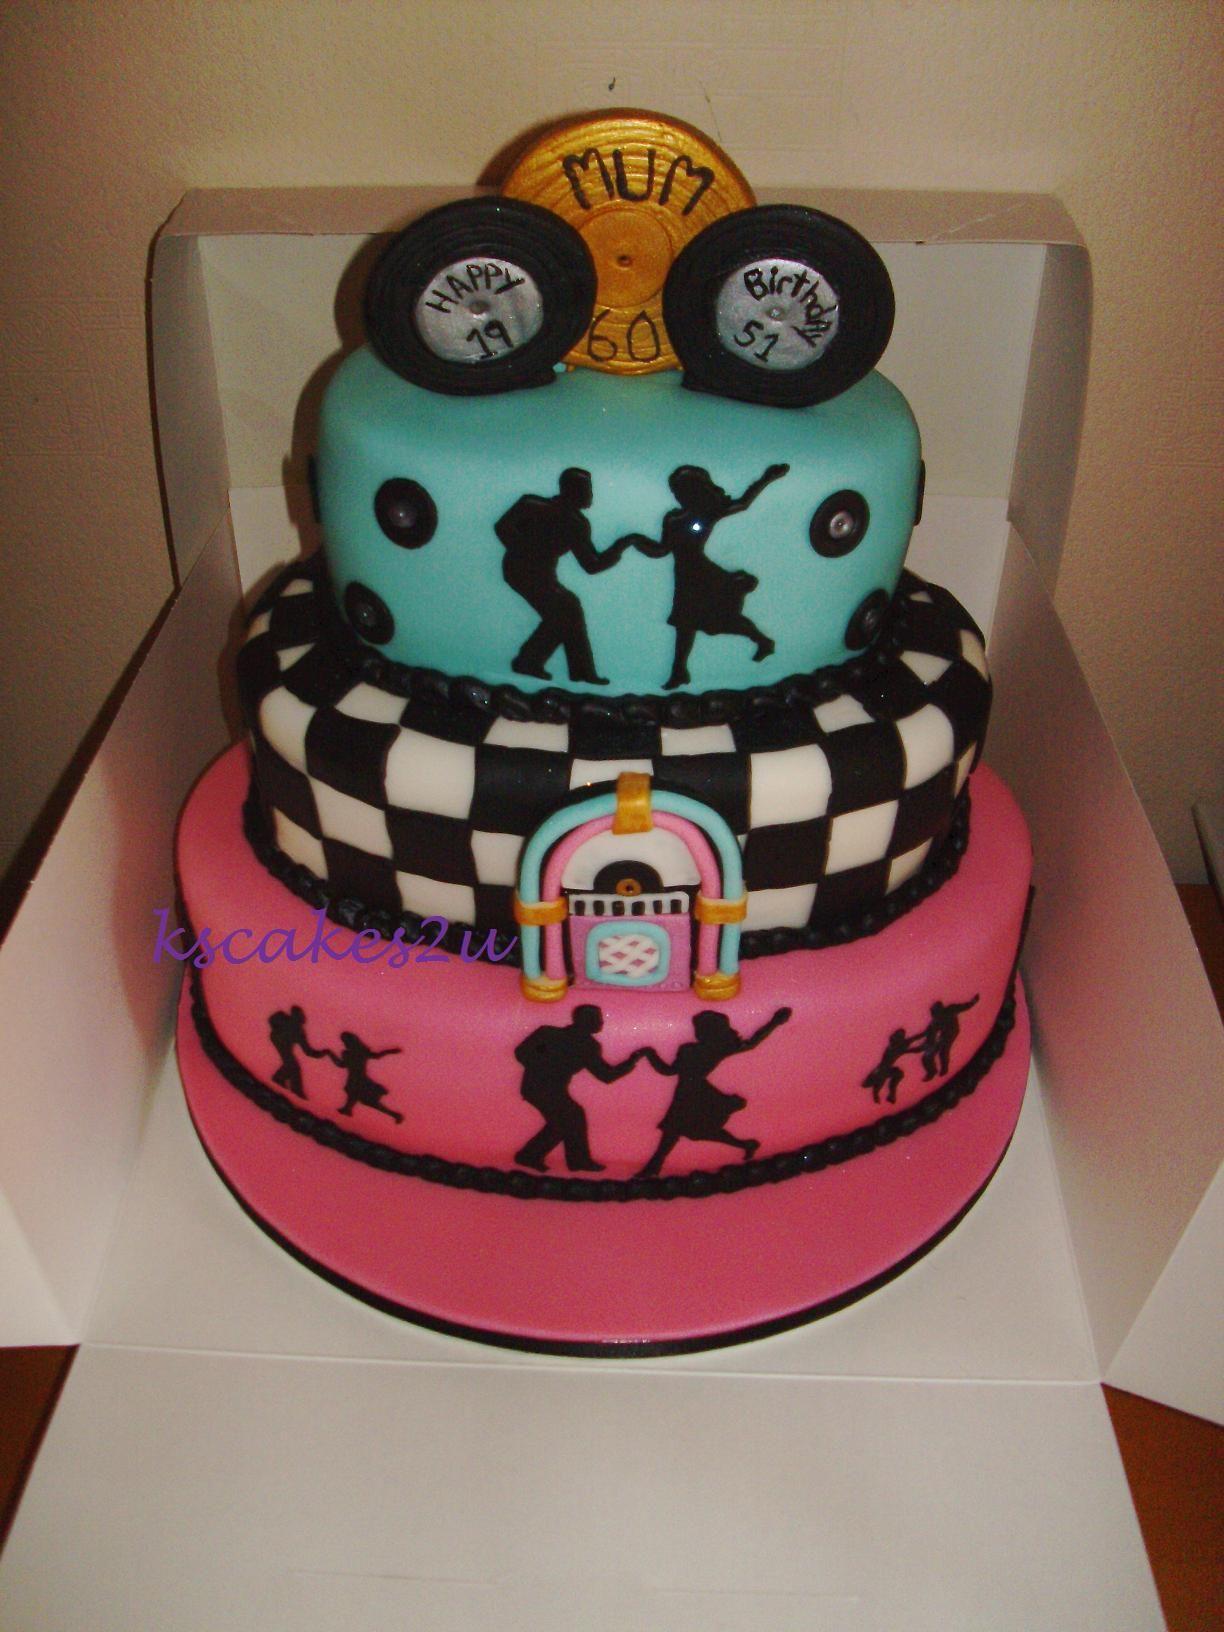 1950 S Theme 3 Tier Oval Birthday Cake 60th Birthday